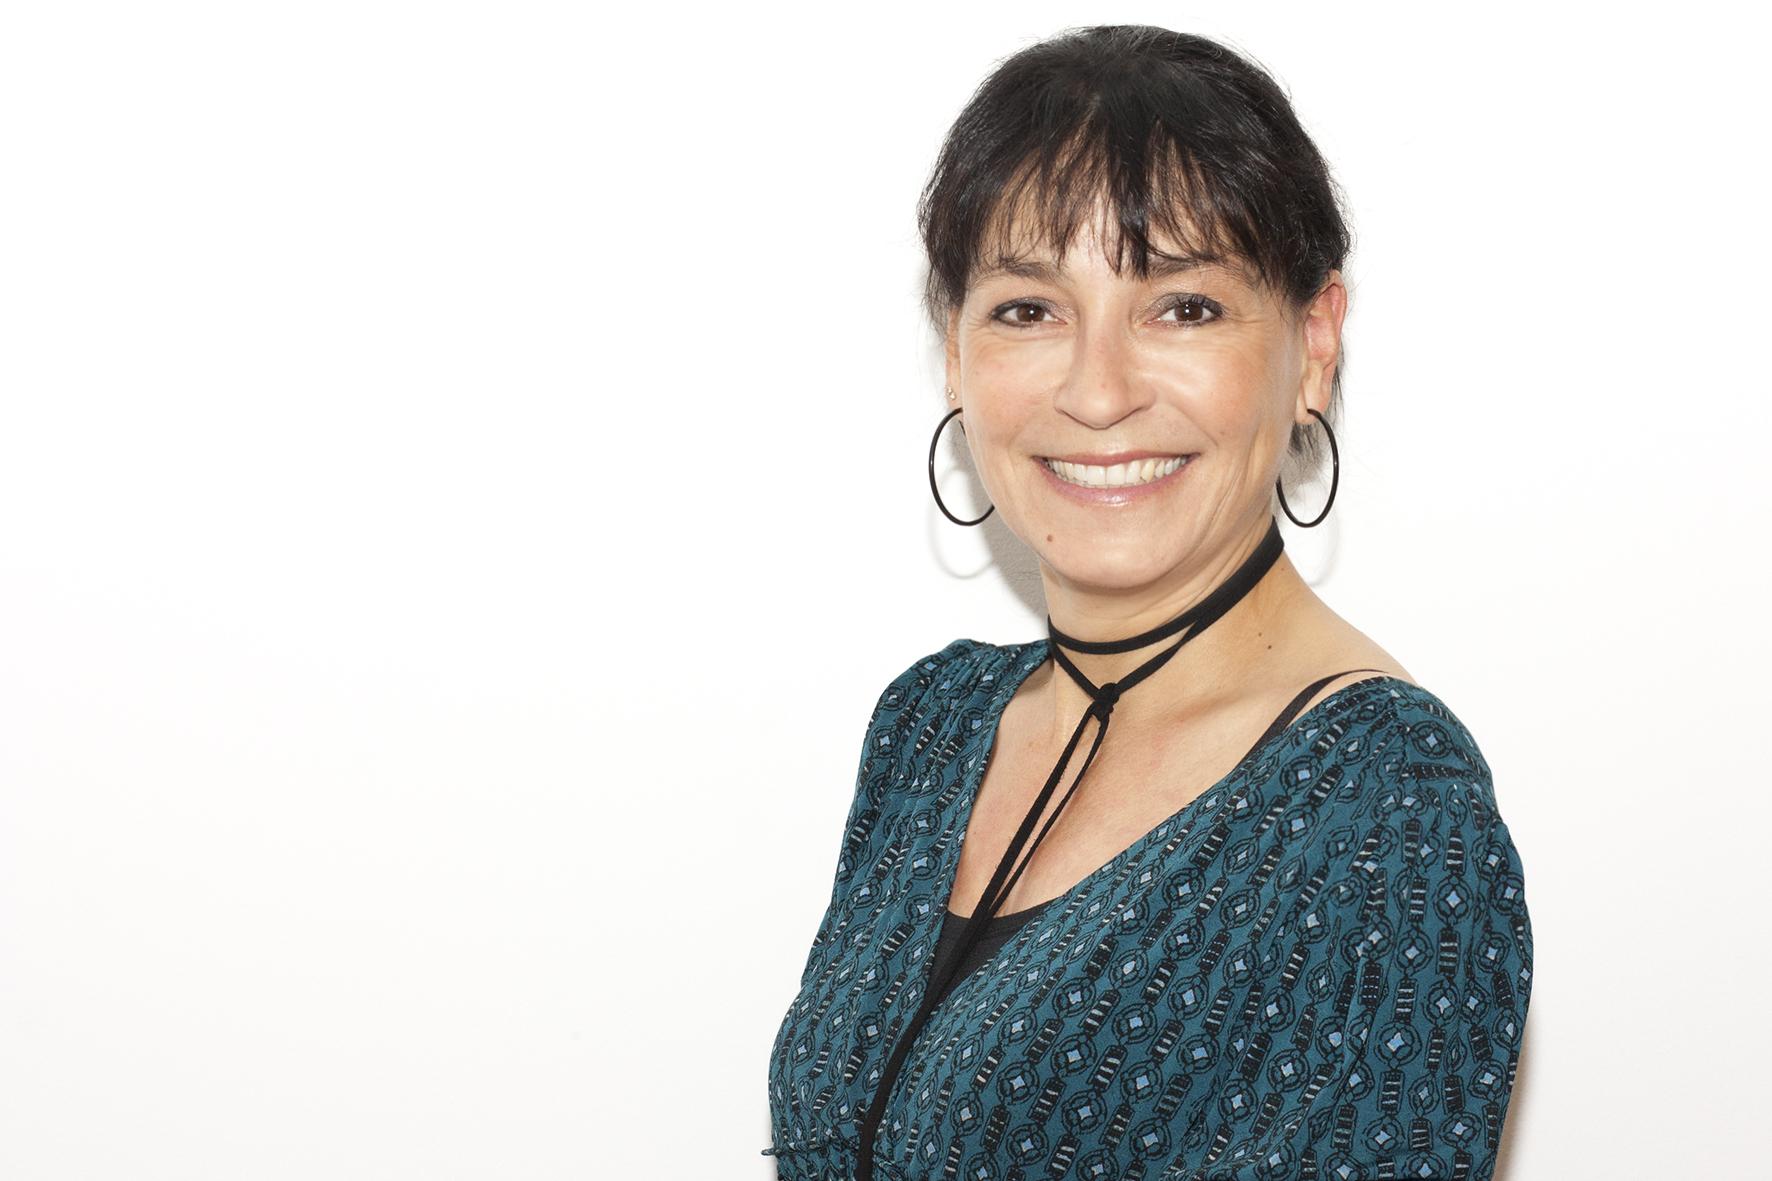 Simone Banghard